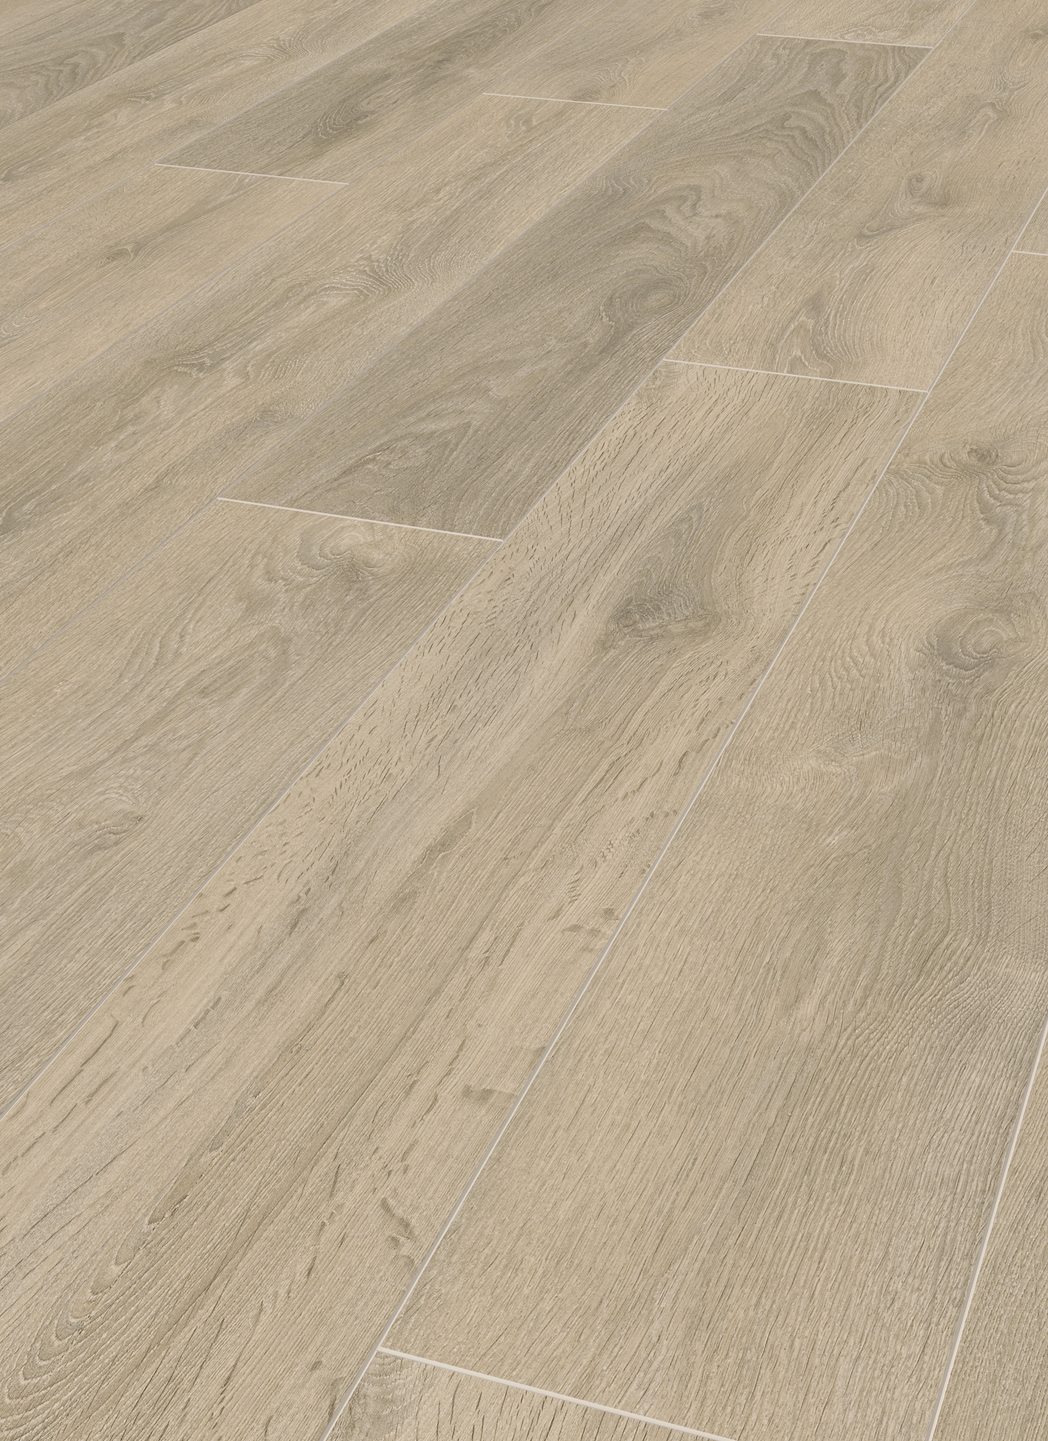 terh rne laminat eiche sandbraun 1 stab a10 breeze line. Black Bedroom Furniture Sets. Home Design Ideas